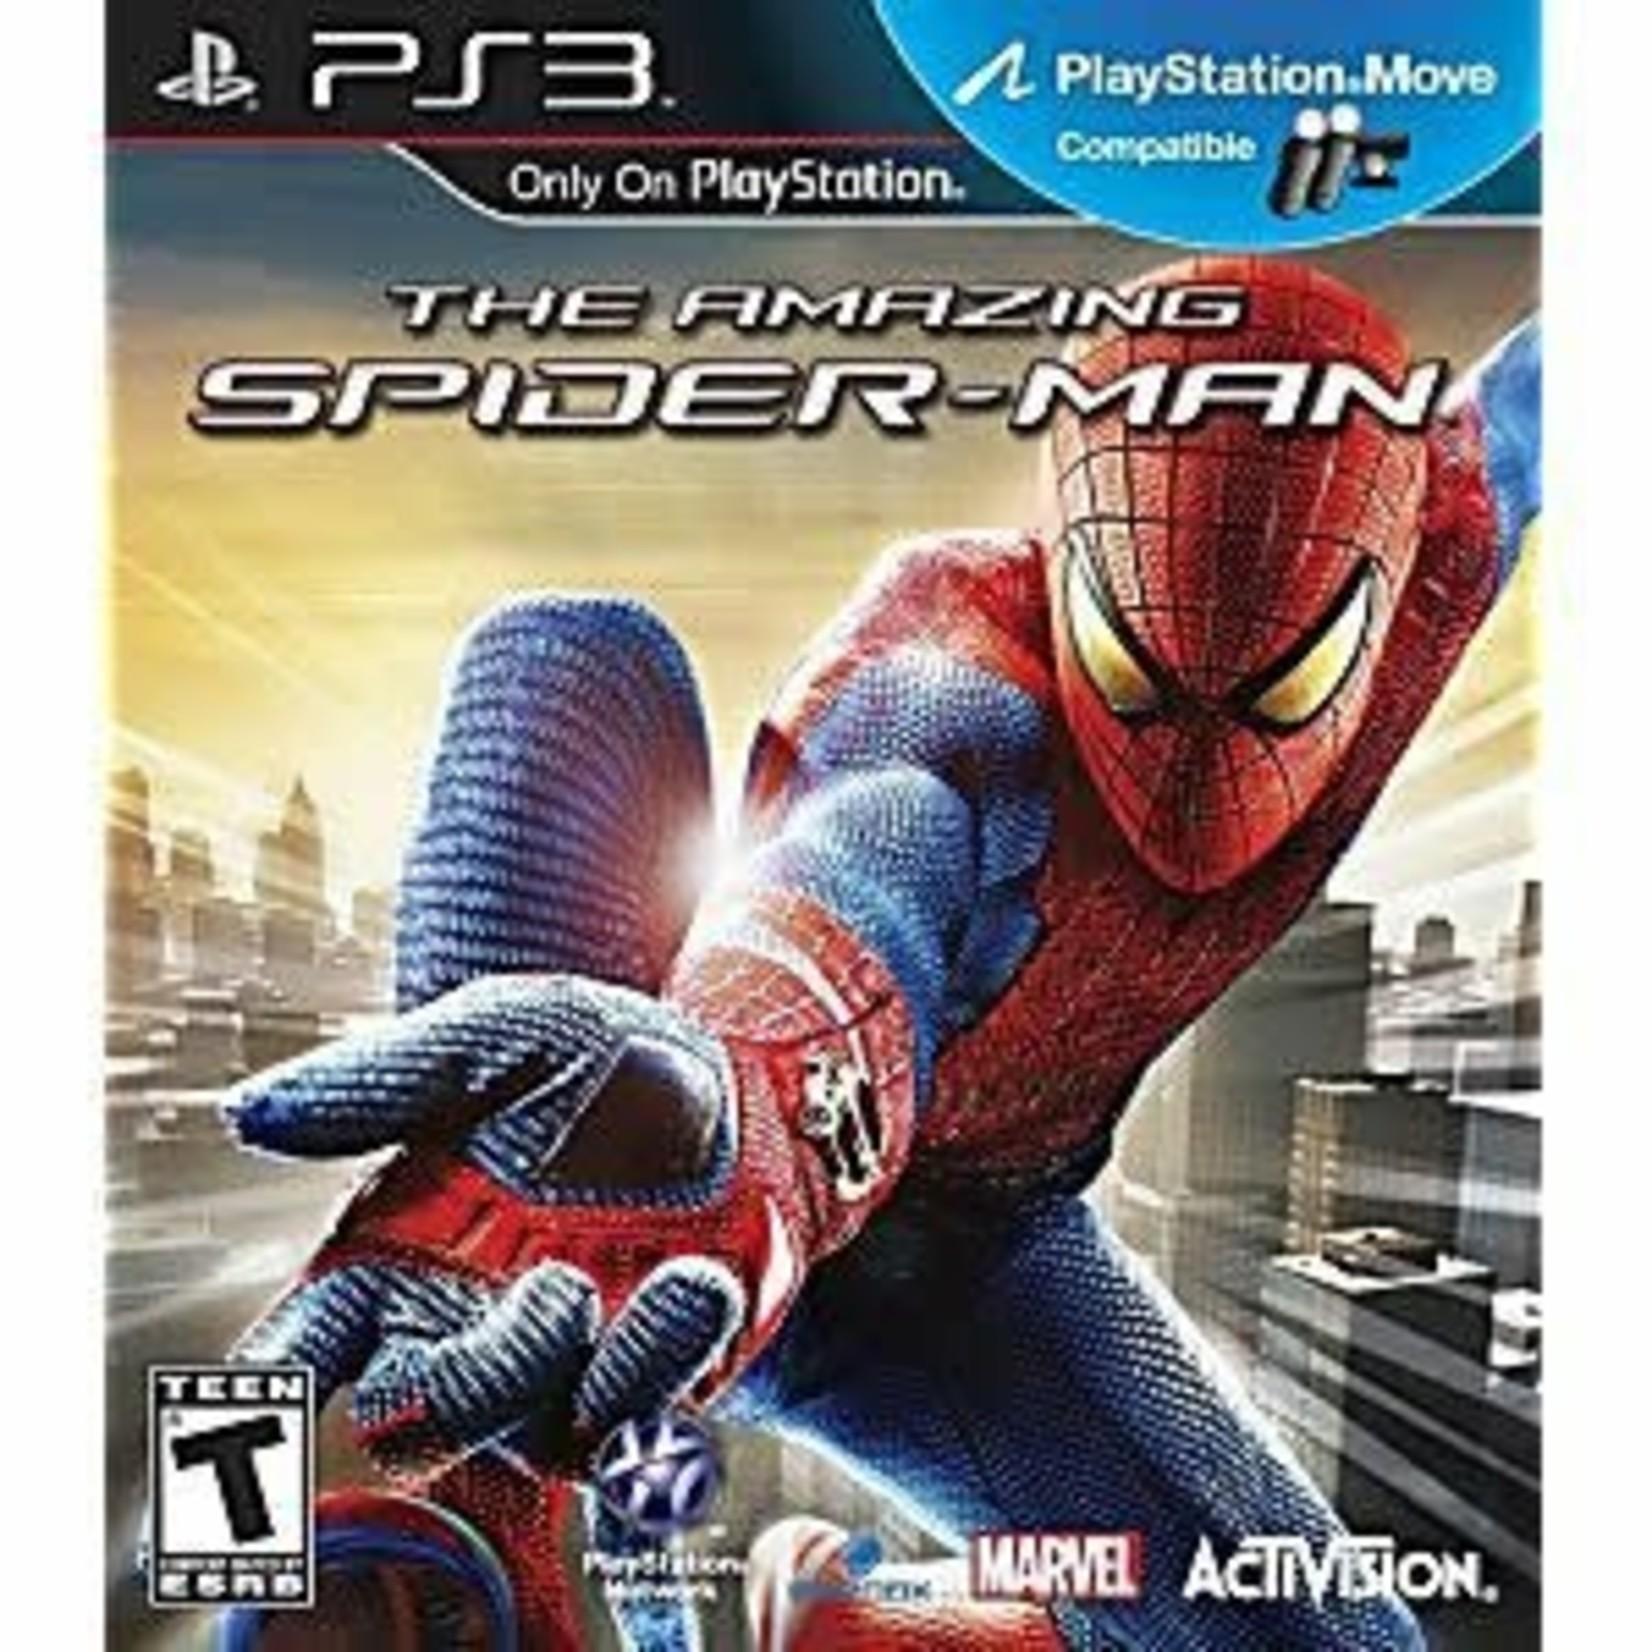 PS3U-THE AMAZING SPIDER-MAN